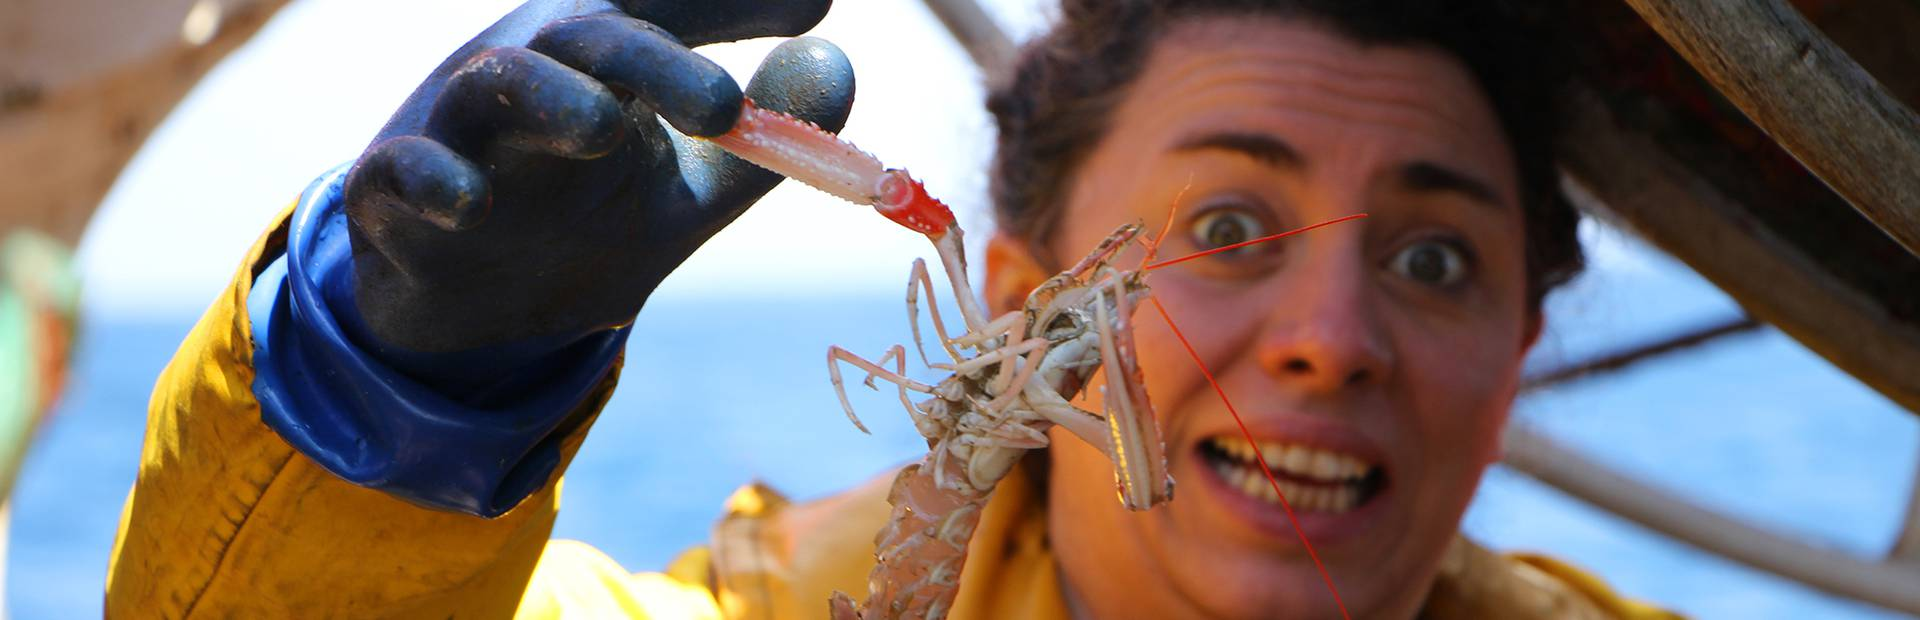 Marlène goes fishing for langoustines © M Pimentel